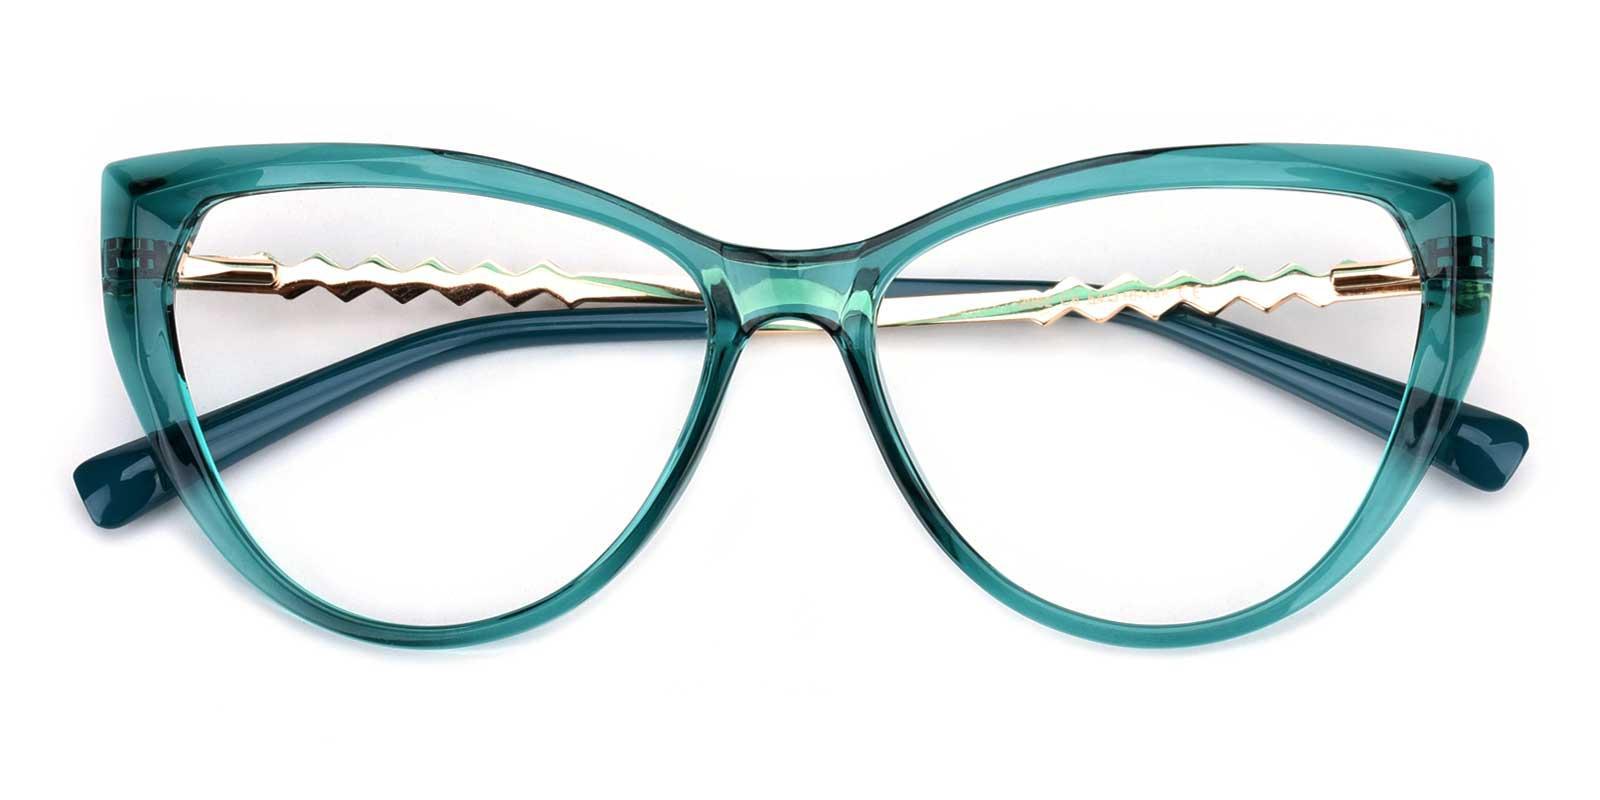 Daydream-Green-Cat-Acetate-Eyeglasses-detail